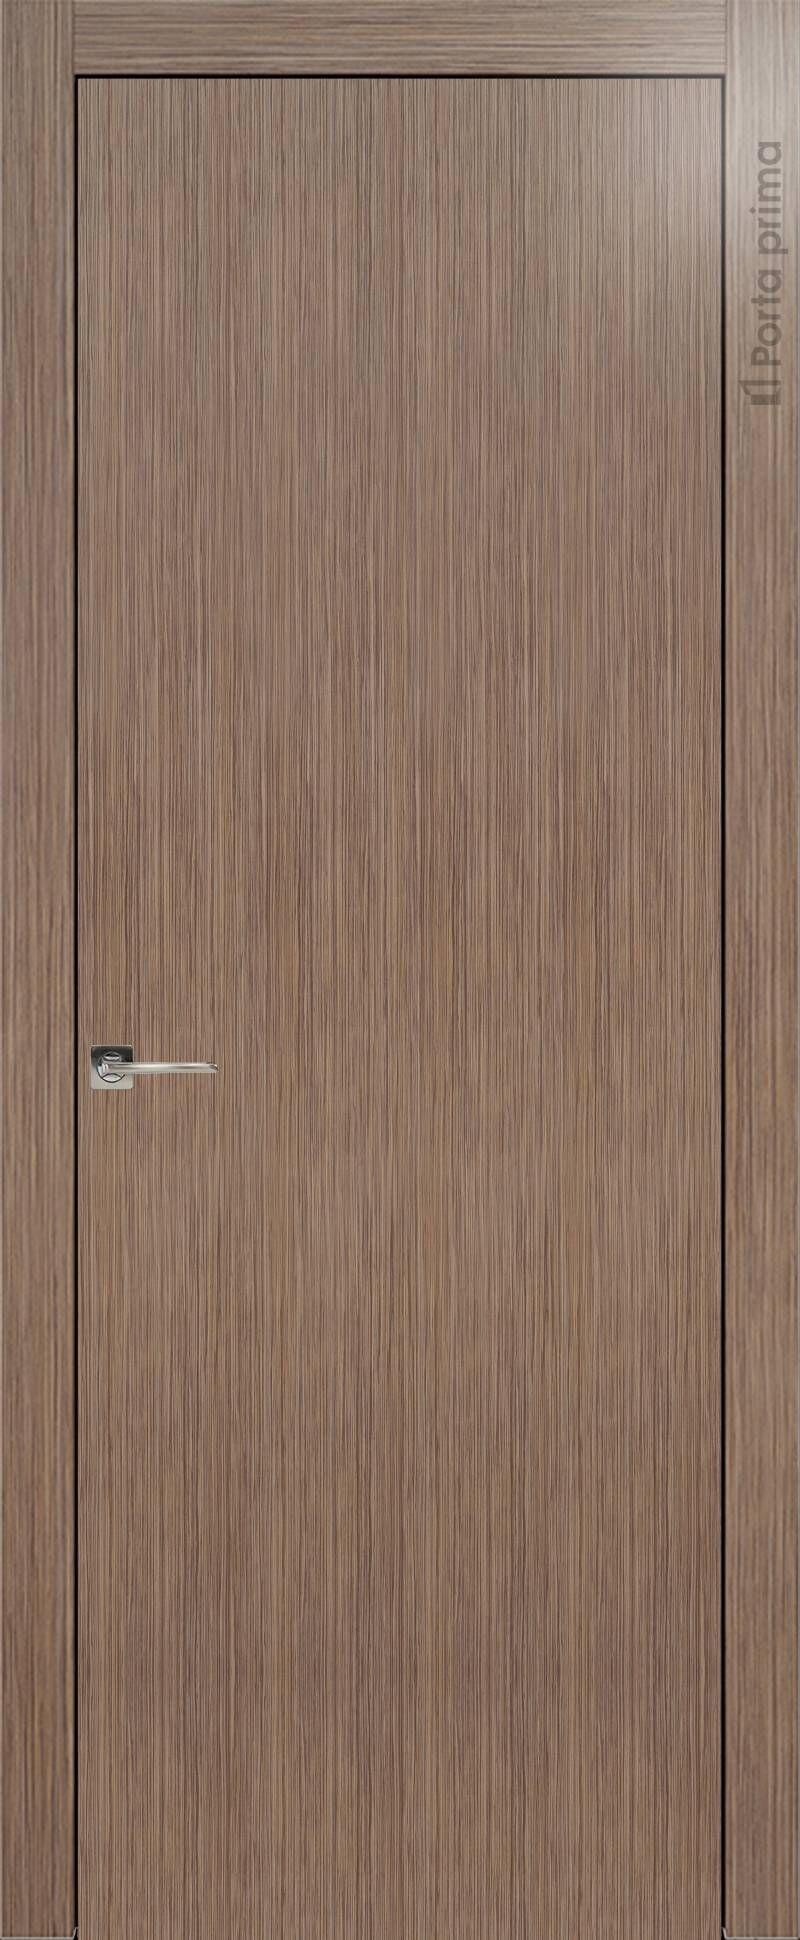 Tivoli А-1 цвет - Орех Без стекла (ДГ)